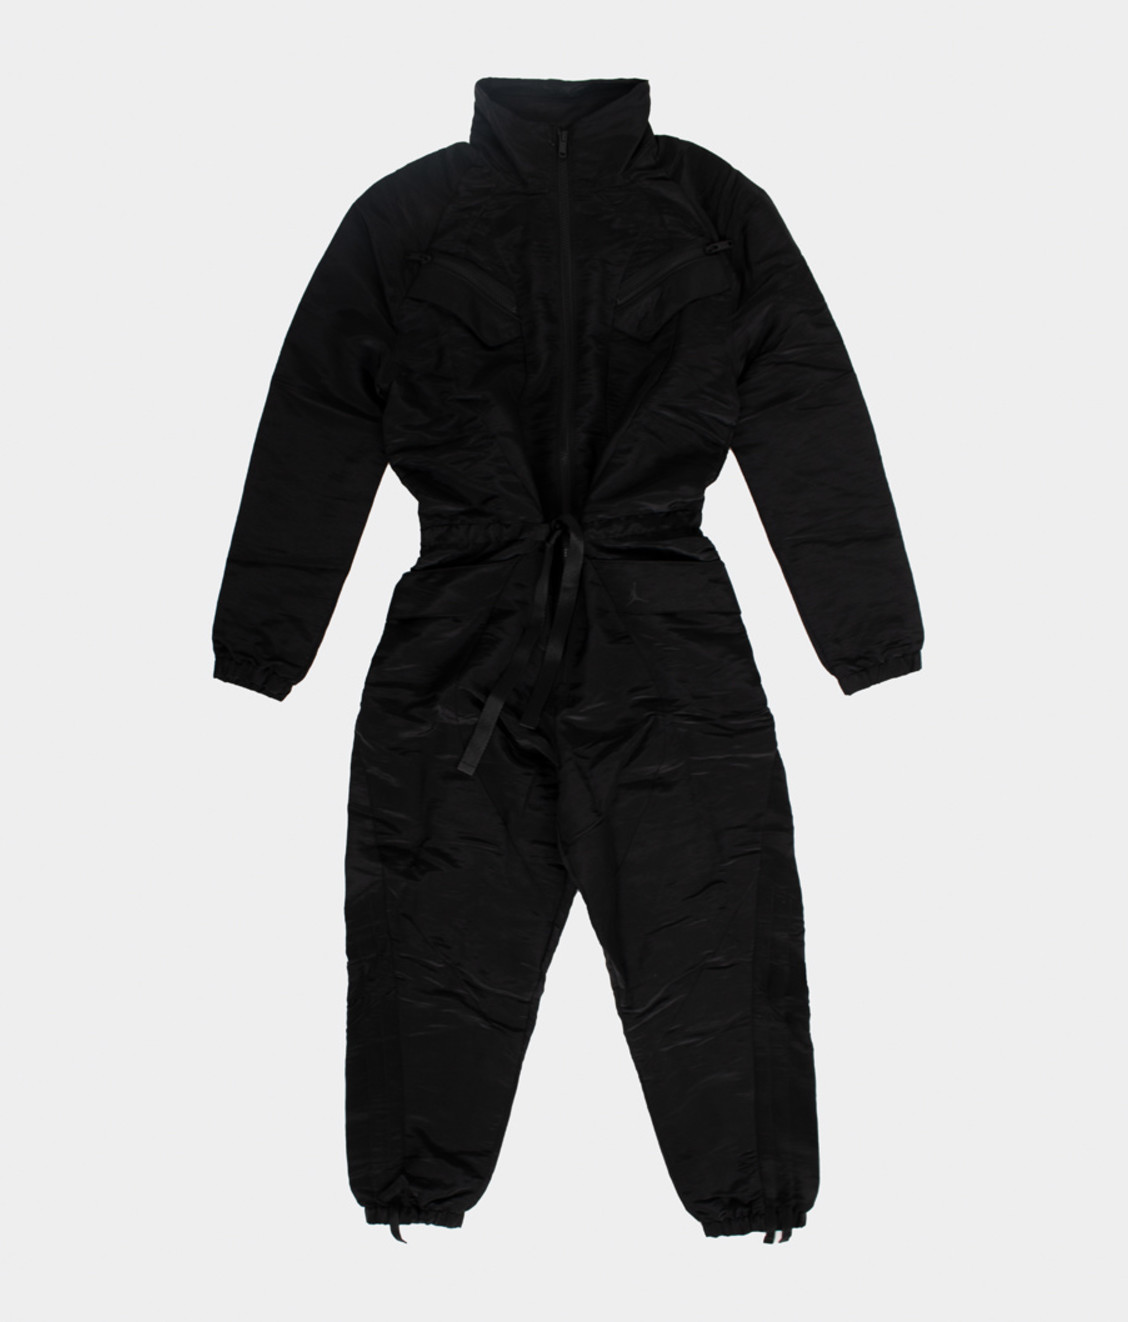 Nike Jordan Flight Suit Black